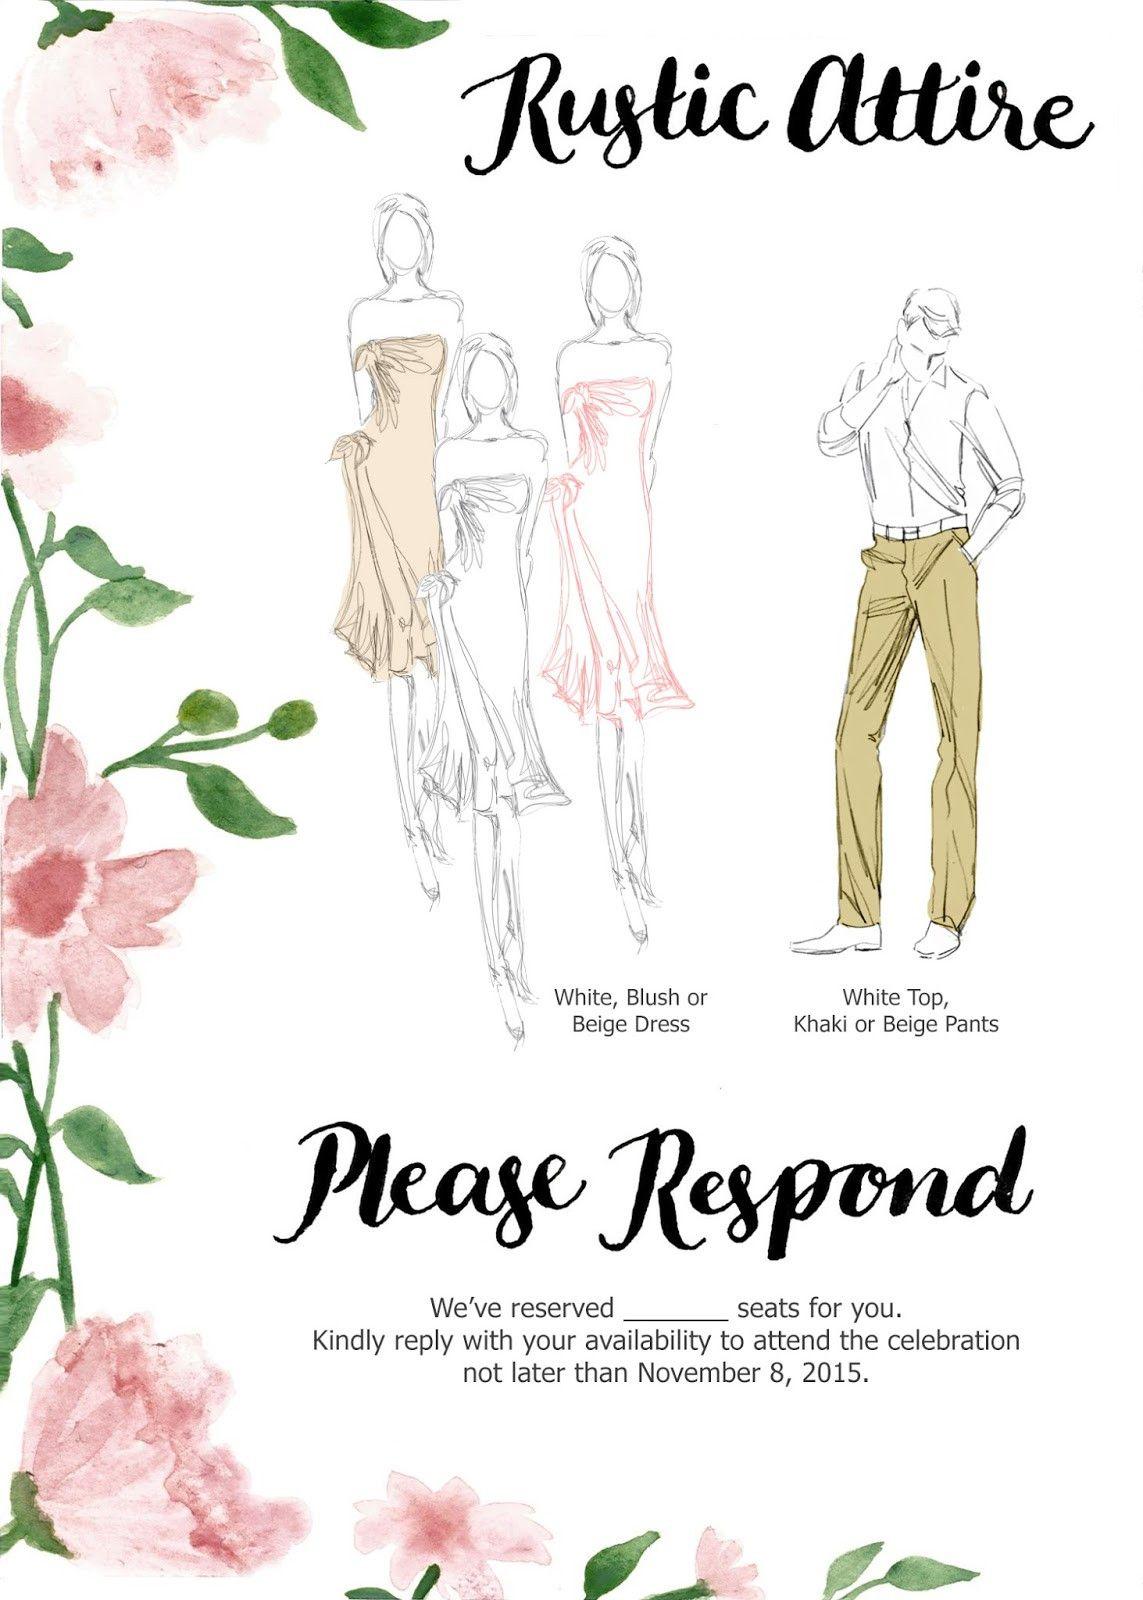 Pin By Joyce Masongsong On My Saves Dress Code Wedding Dress Invitations Wedding Dress Invitations [ 1600 x 1143 Pixel ]